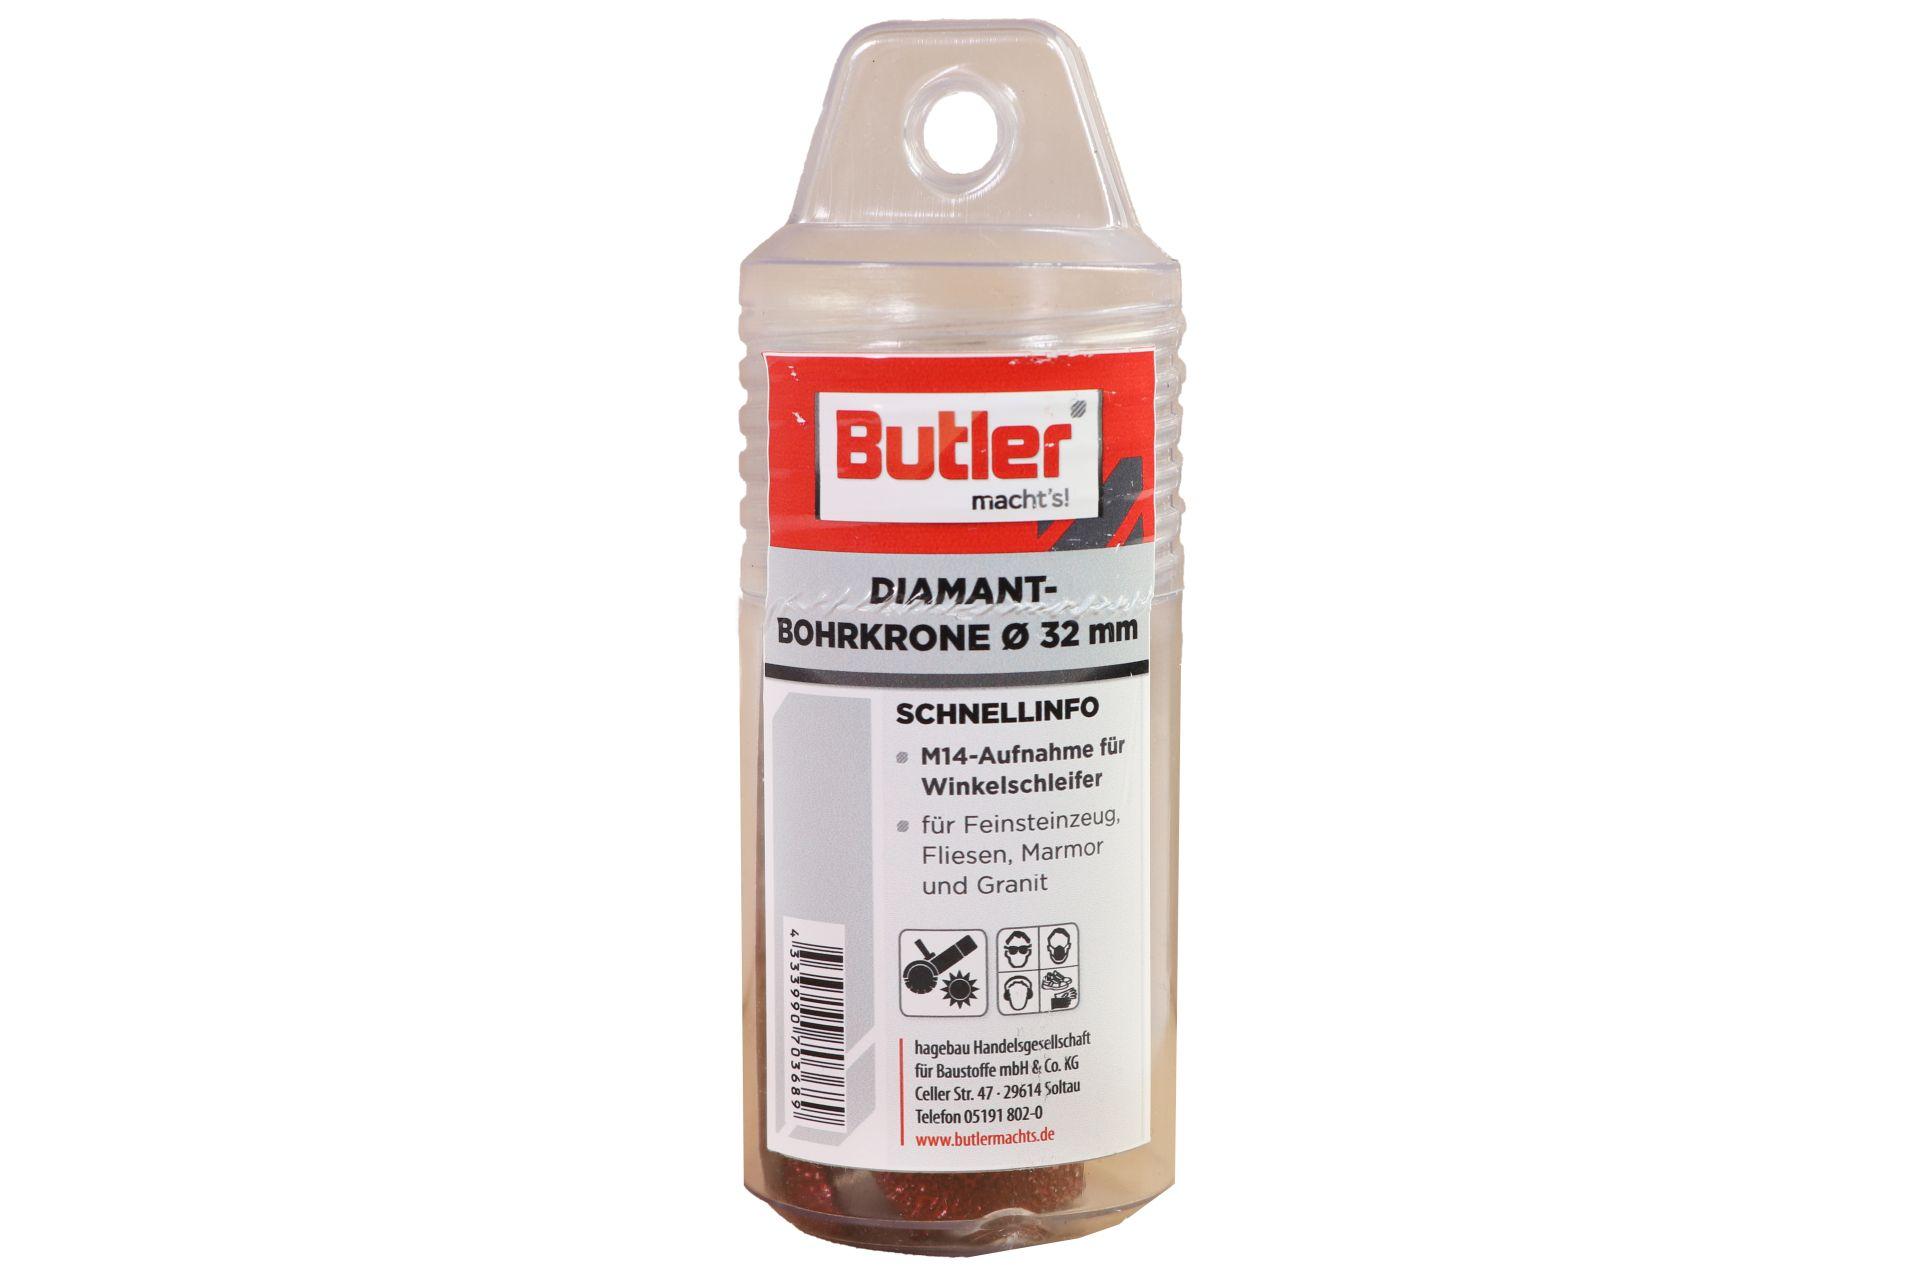 Butler macht's! Diamant-Bohrkrone, Ø 32 mm, Aufnahme M14, Bohrtiefe 45 mm